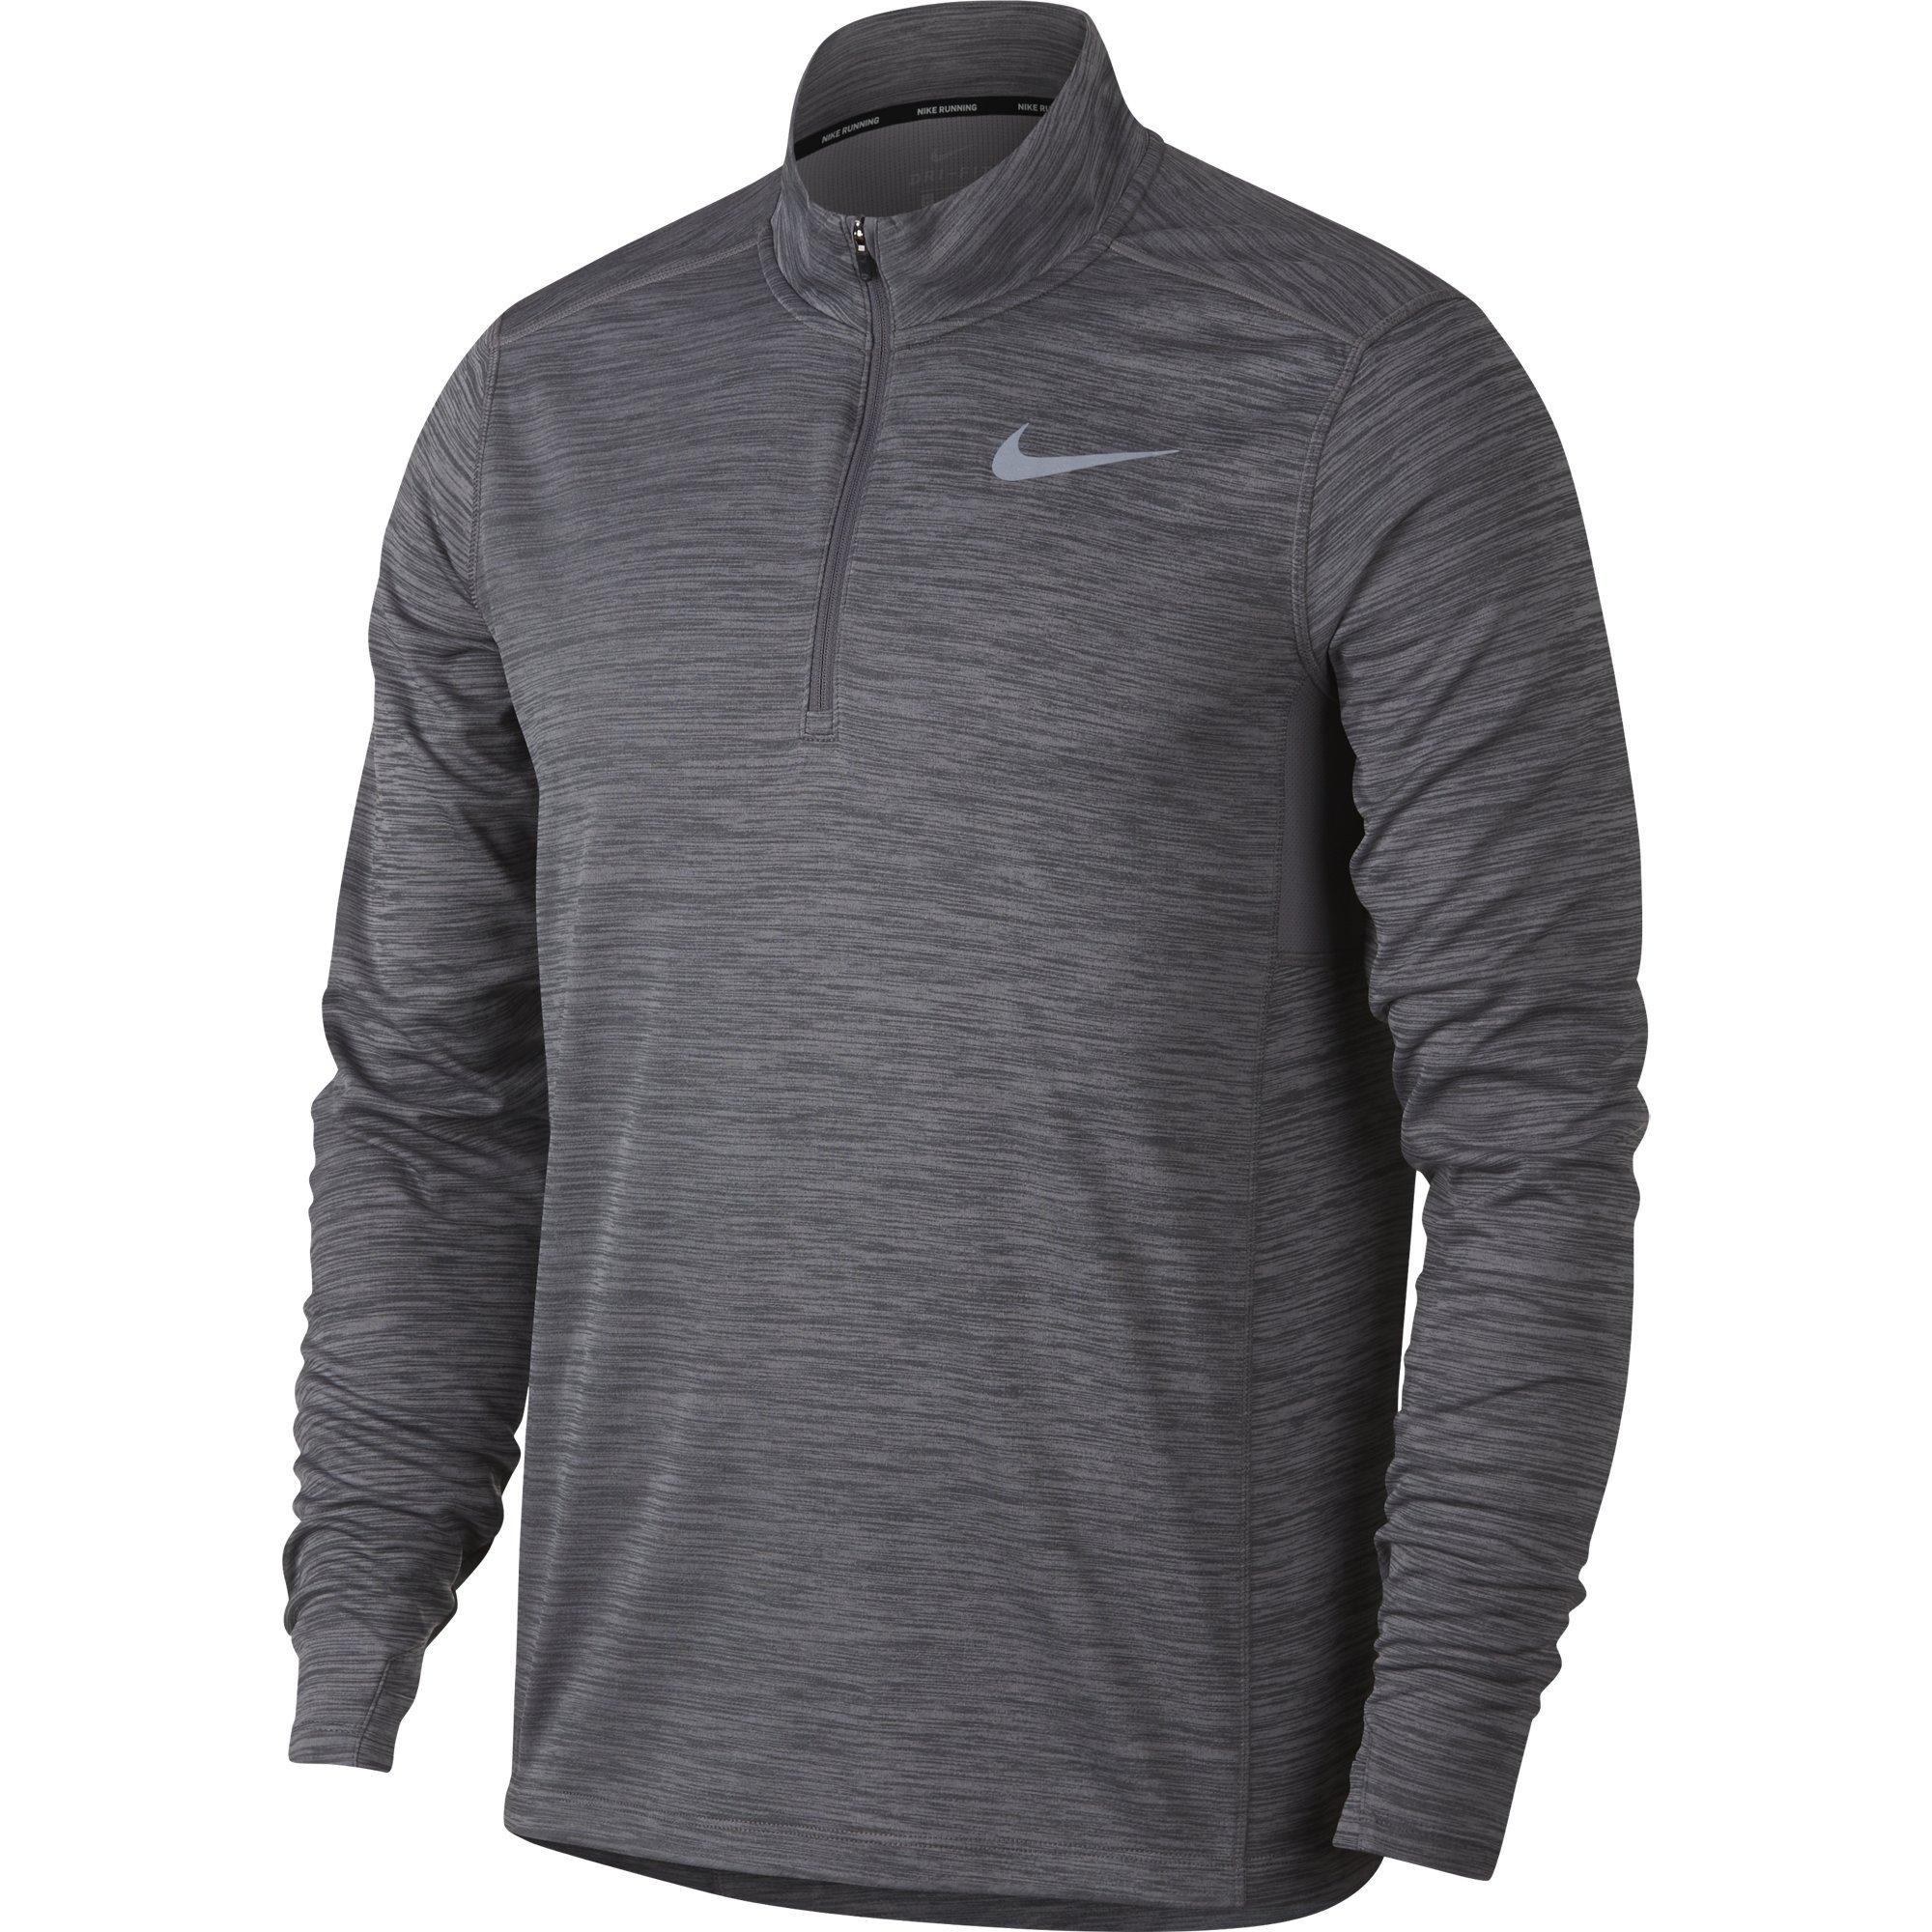 NIKE Men's Pacer Half-Zip Top, Gunsmoke/Heather, Small by Nike